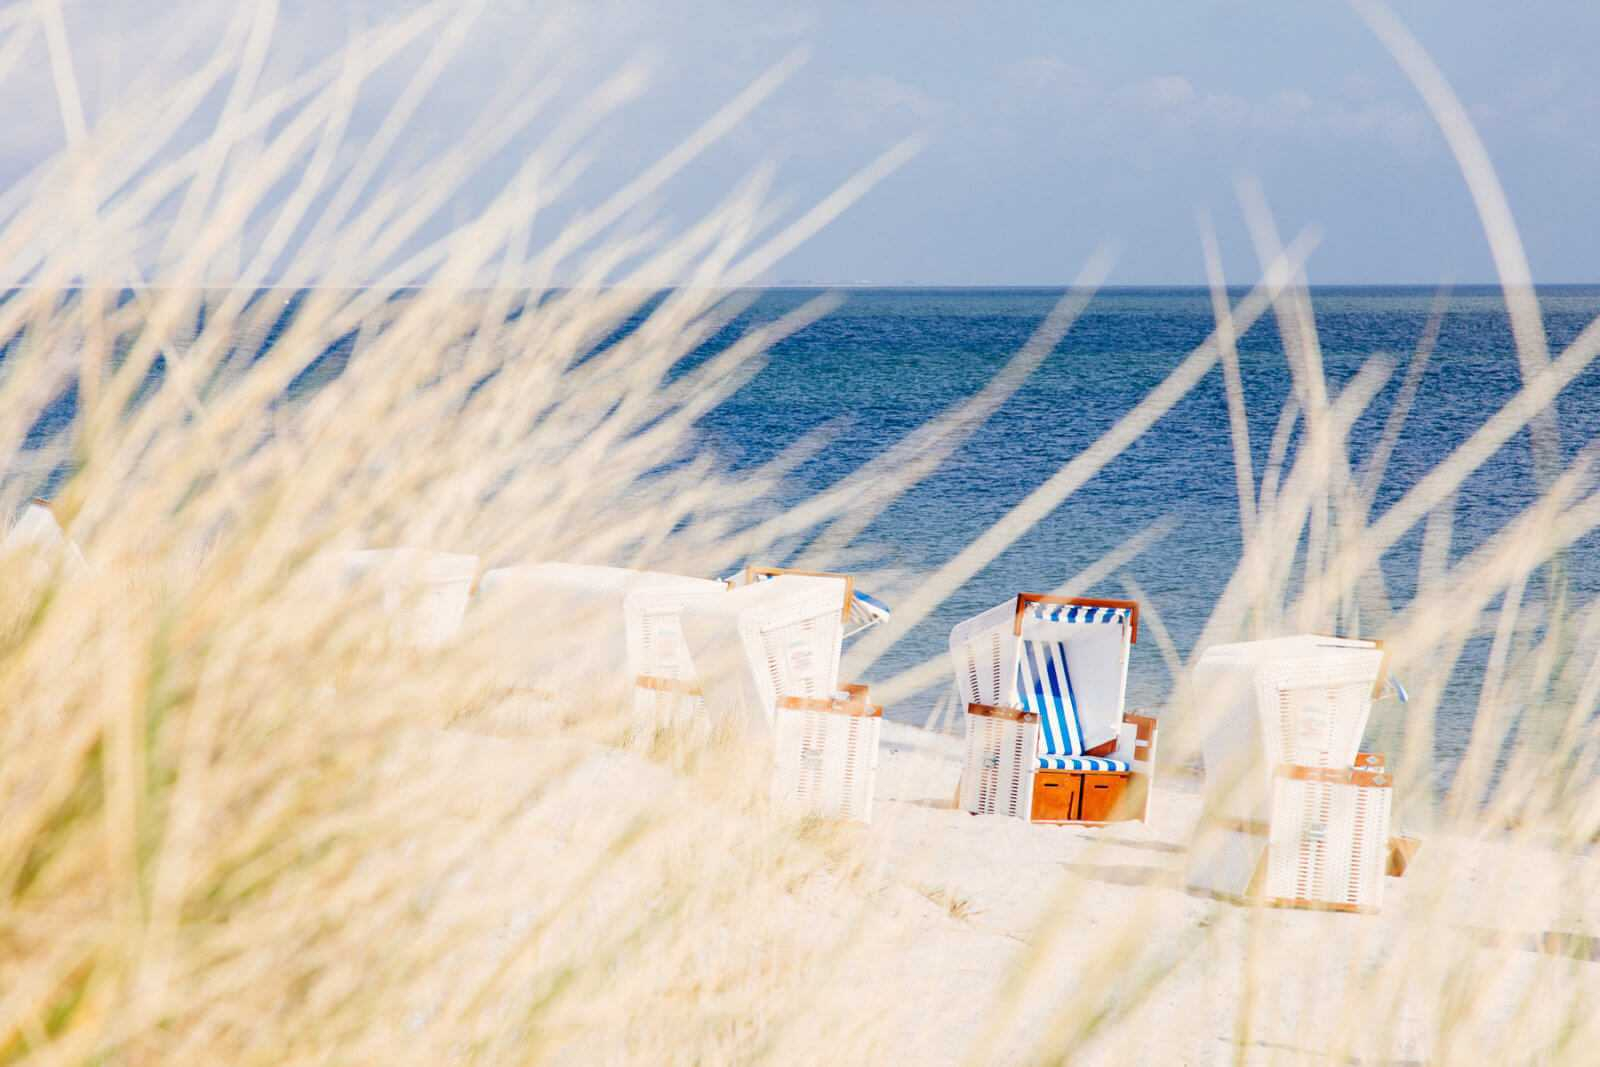 Sylt Lister Ellenbogen Strandkörbe Strand in List